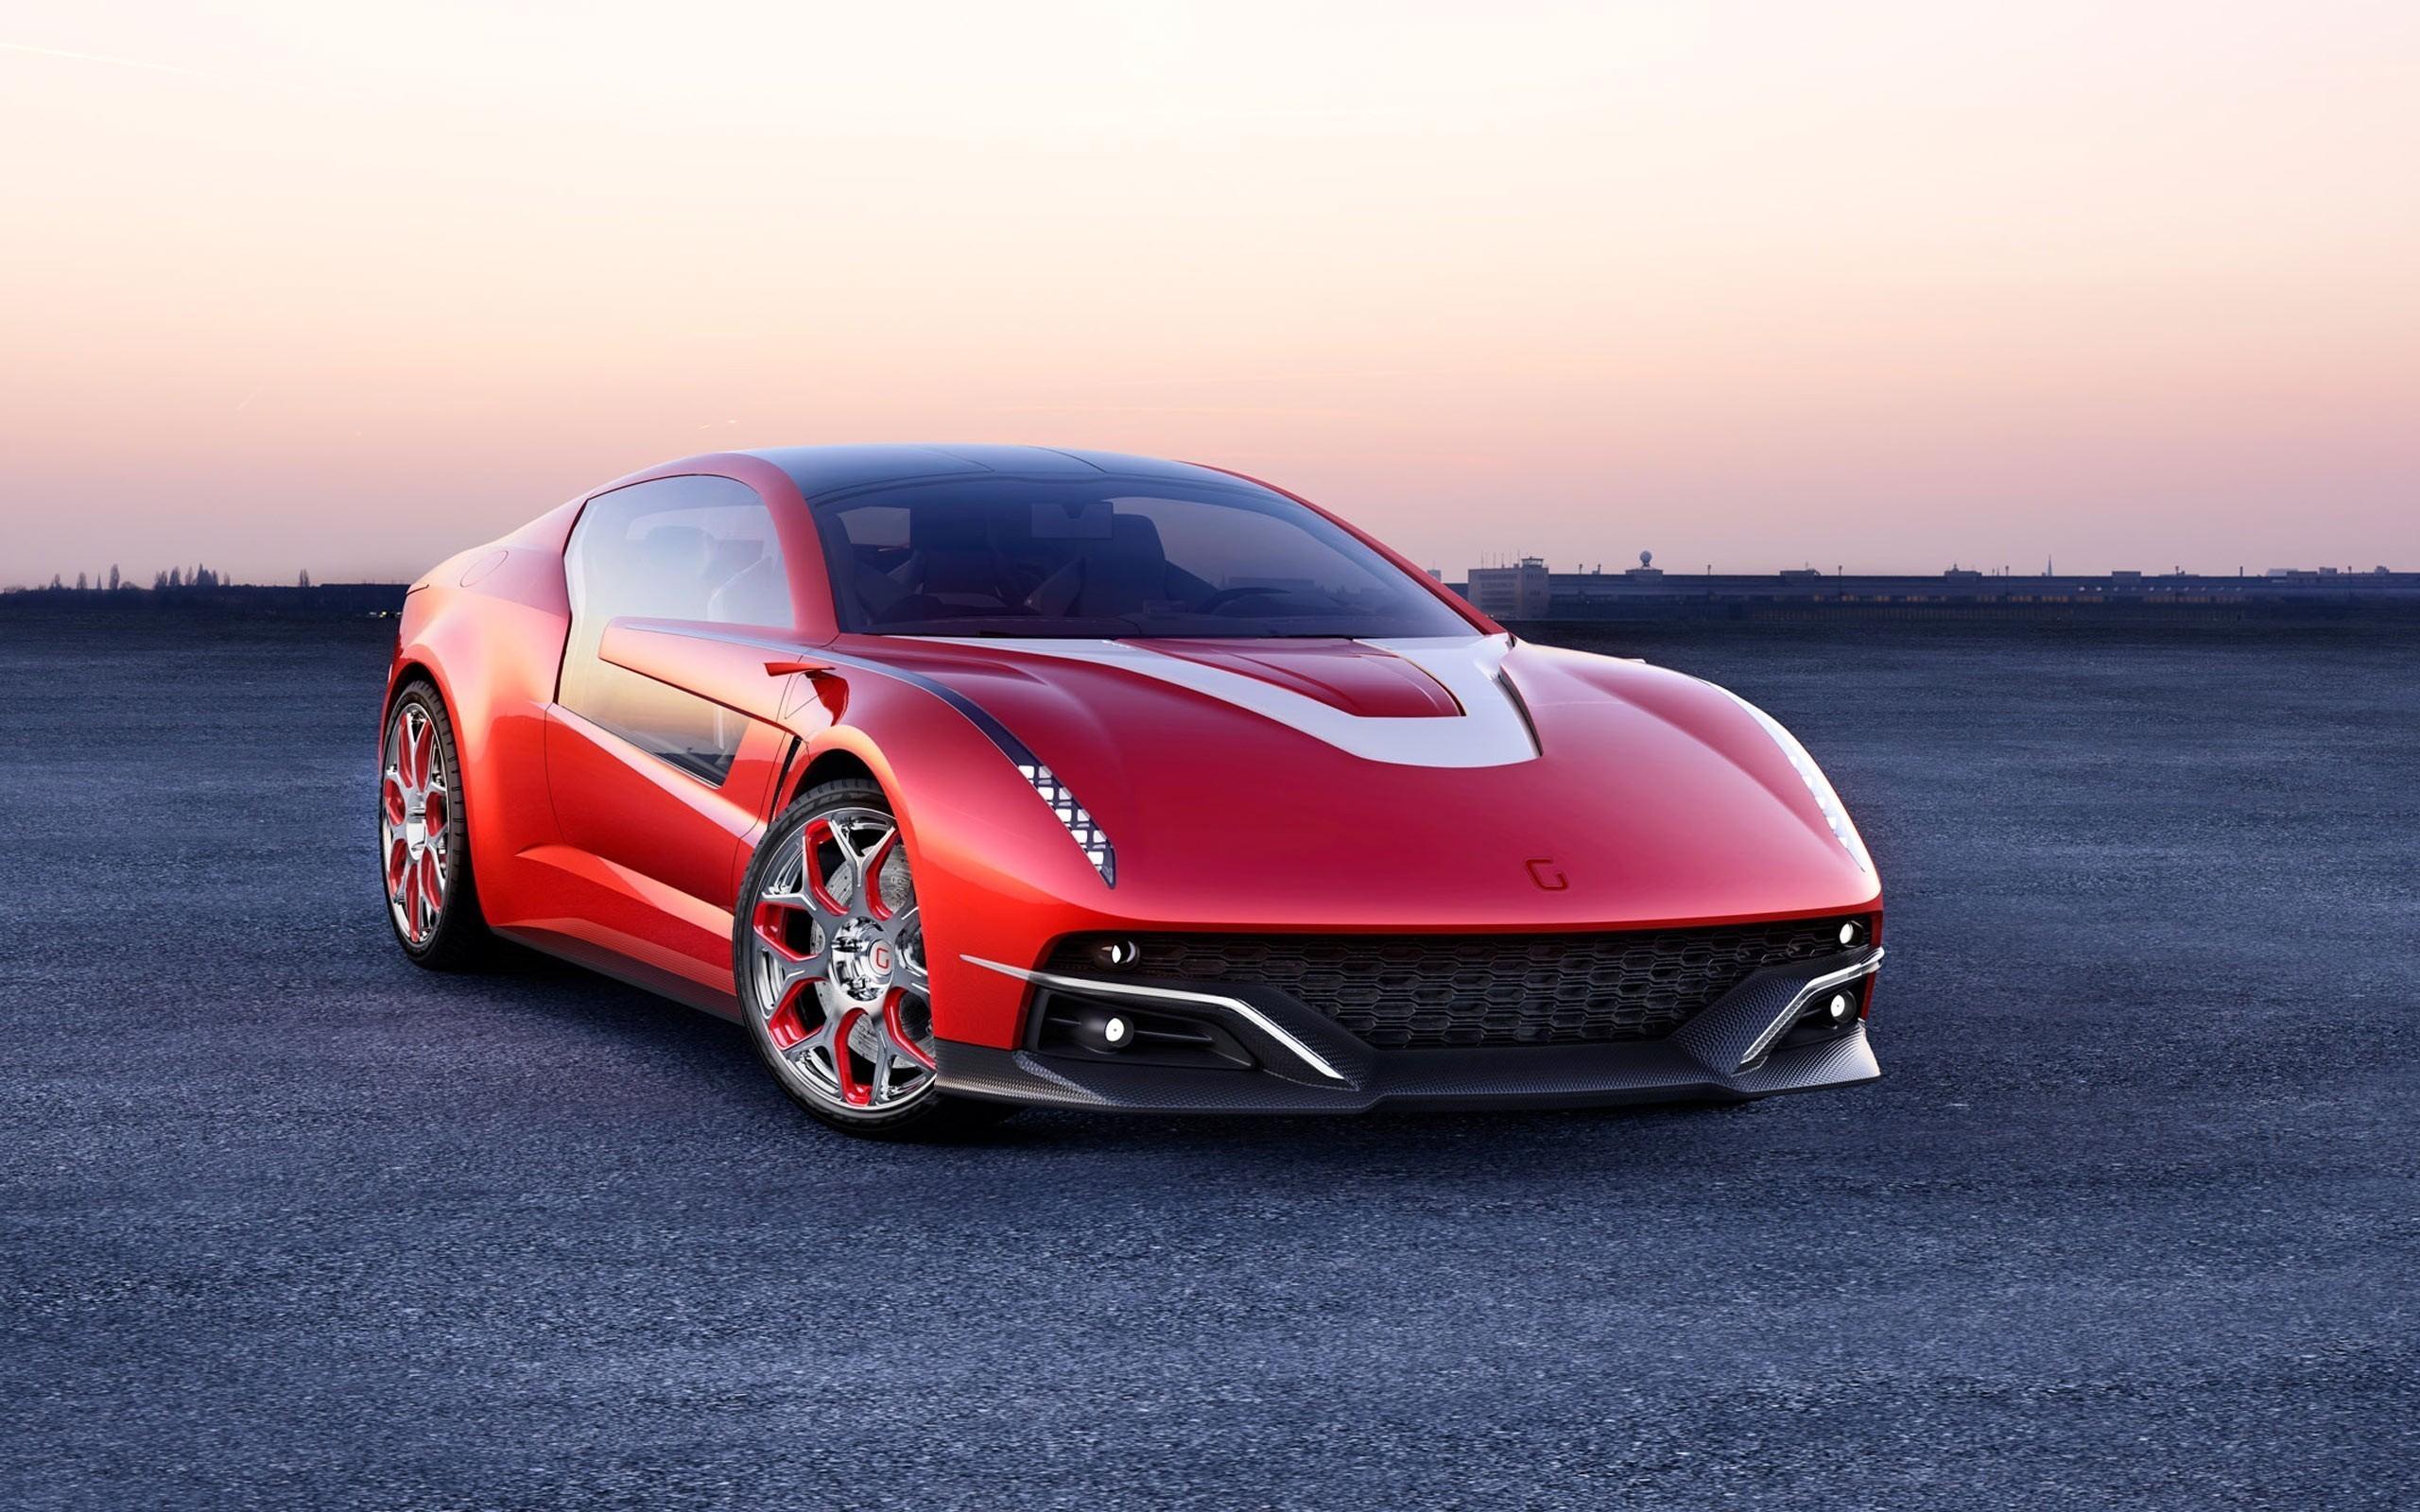 Italdesign GiuGiaro Brivido Concept Car Wallpapers HD Wallpapers 2560x1600